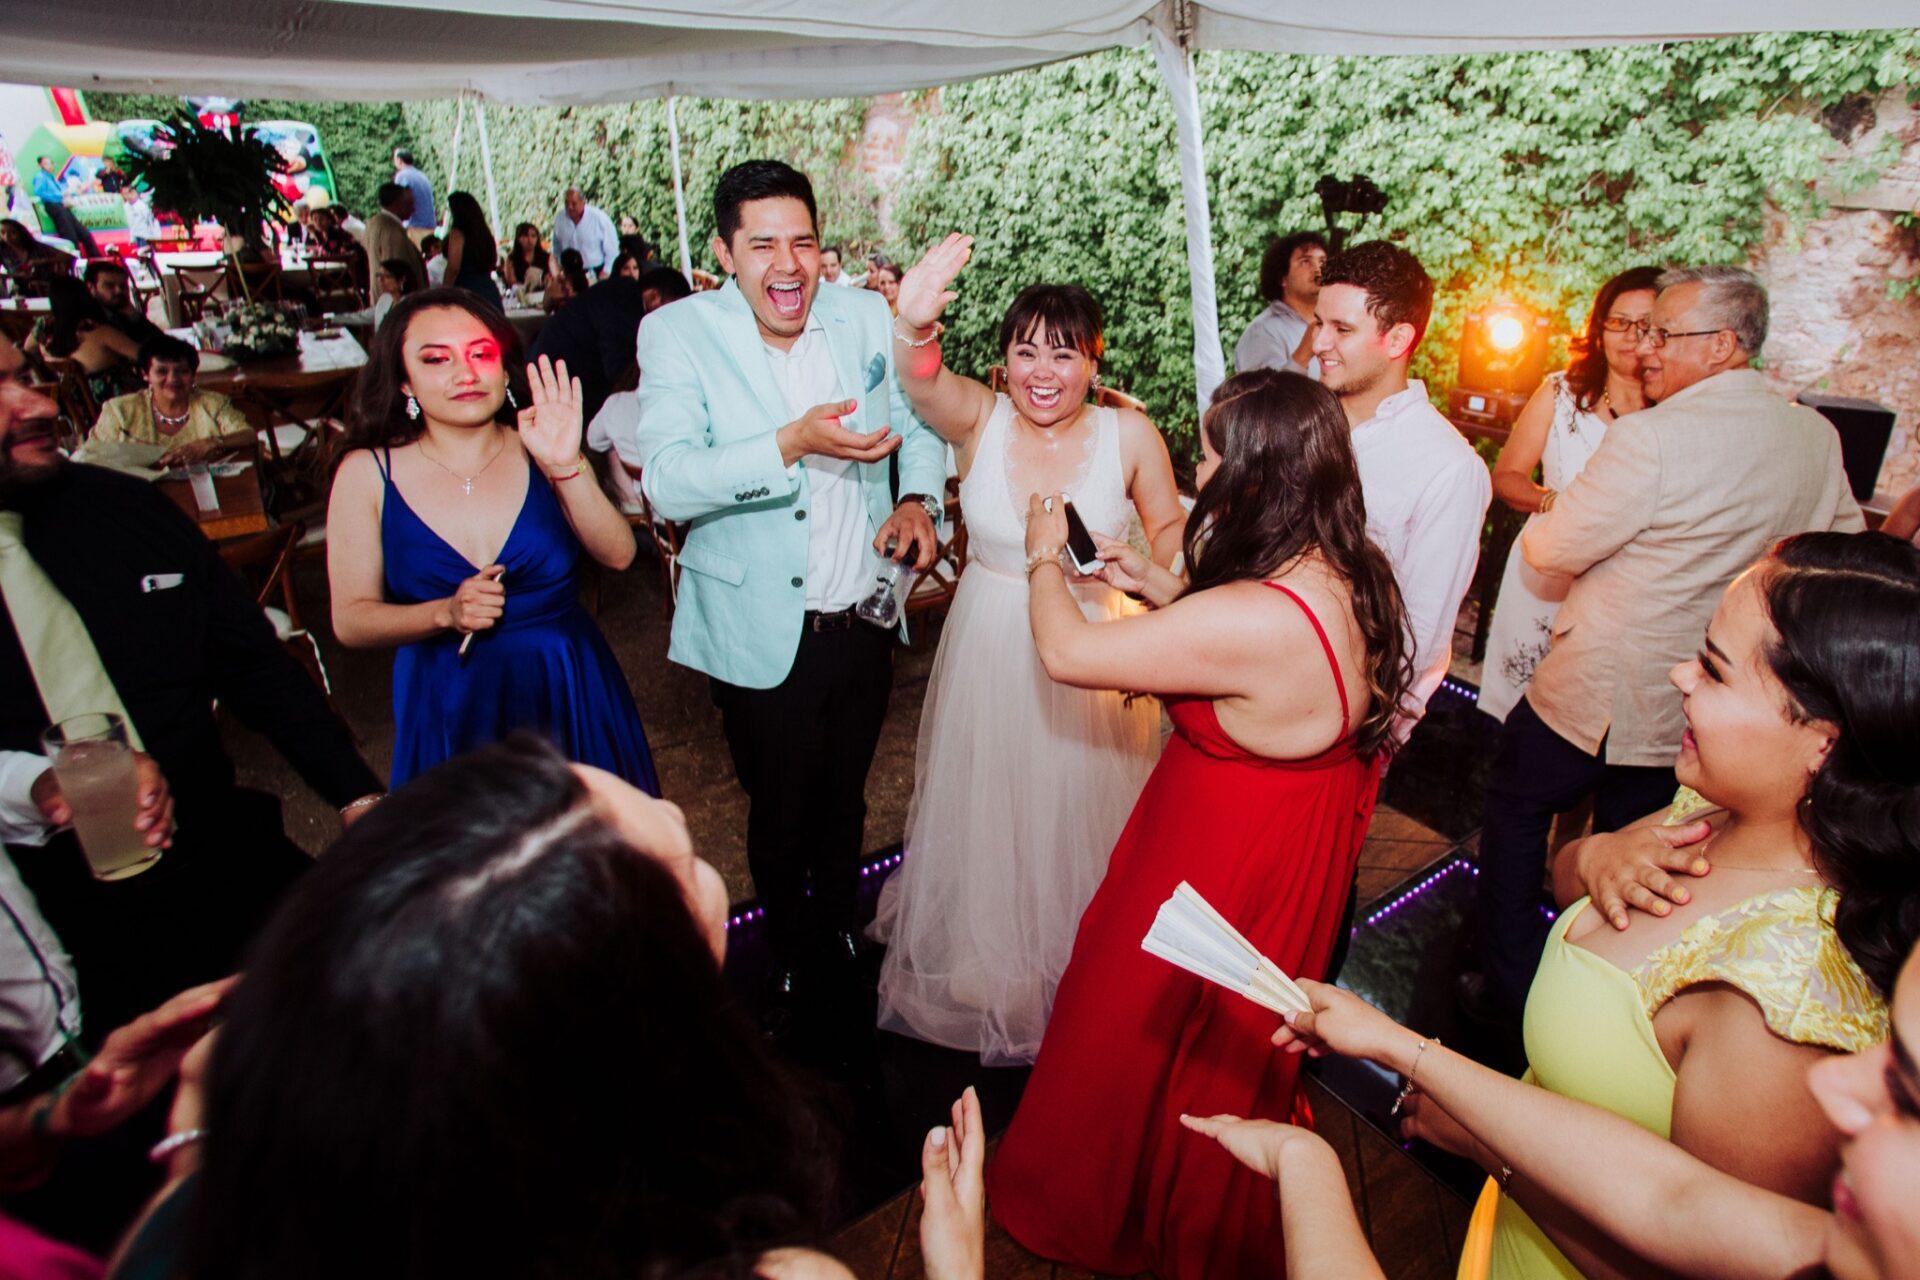 javier_noriega_fotografo_bodas_centro_platero_zacatecas_wedding_photographer39